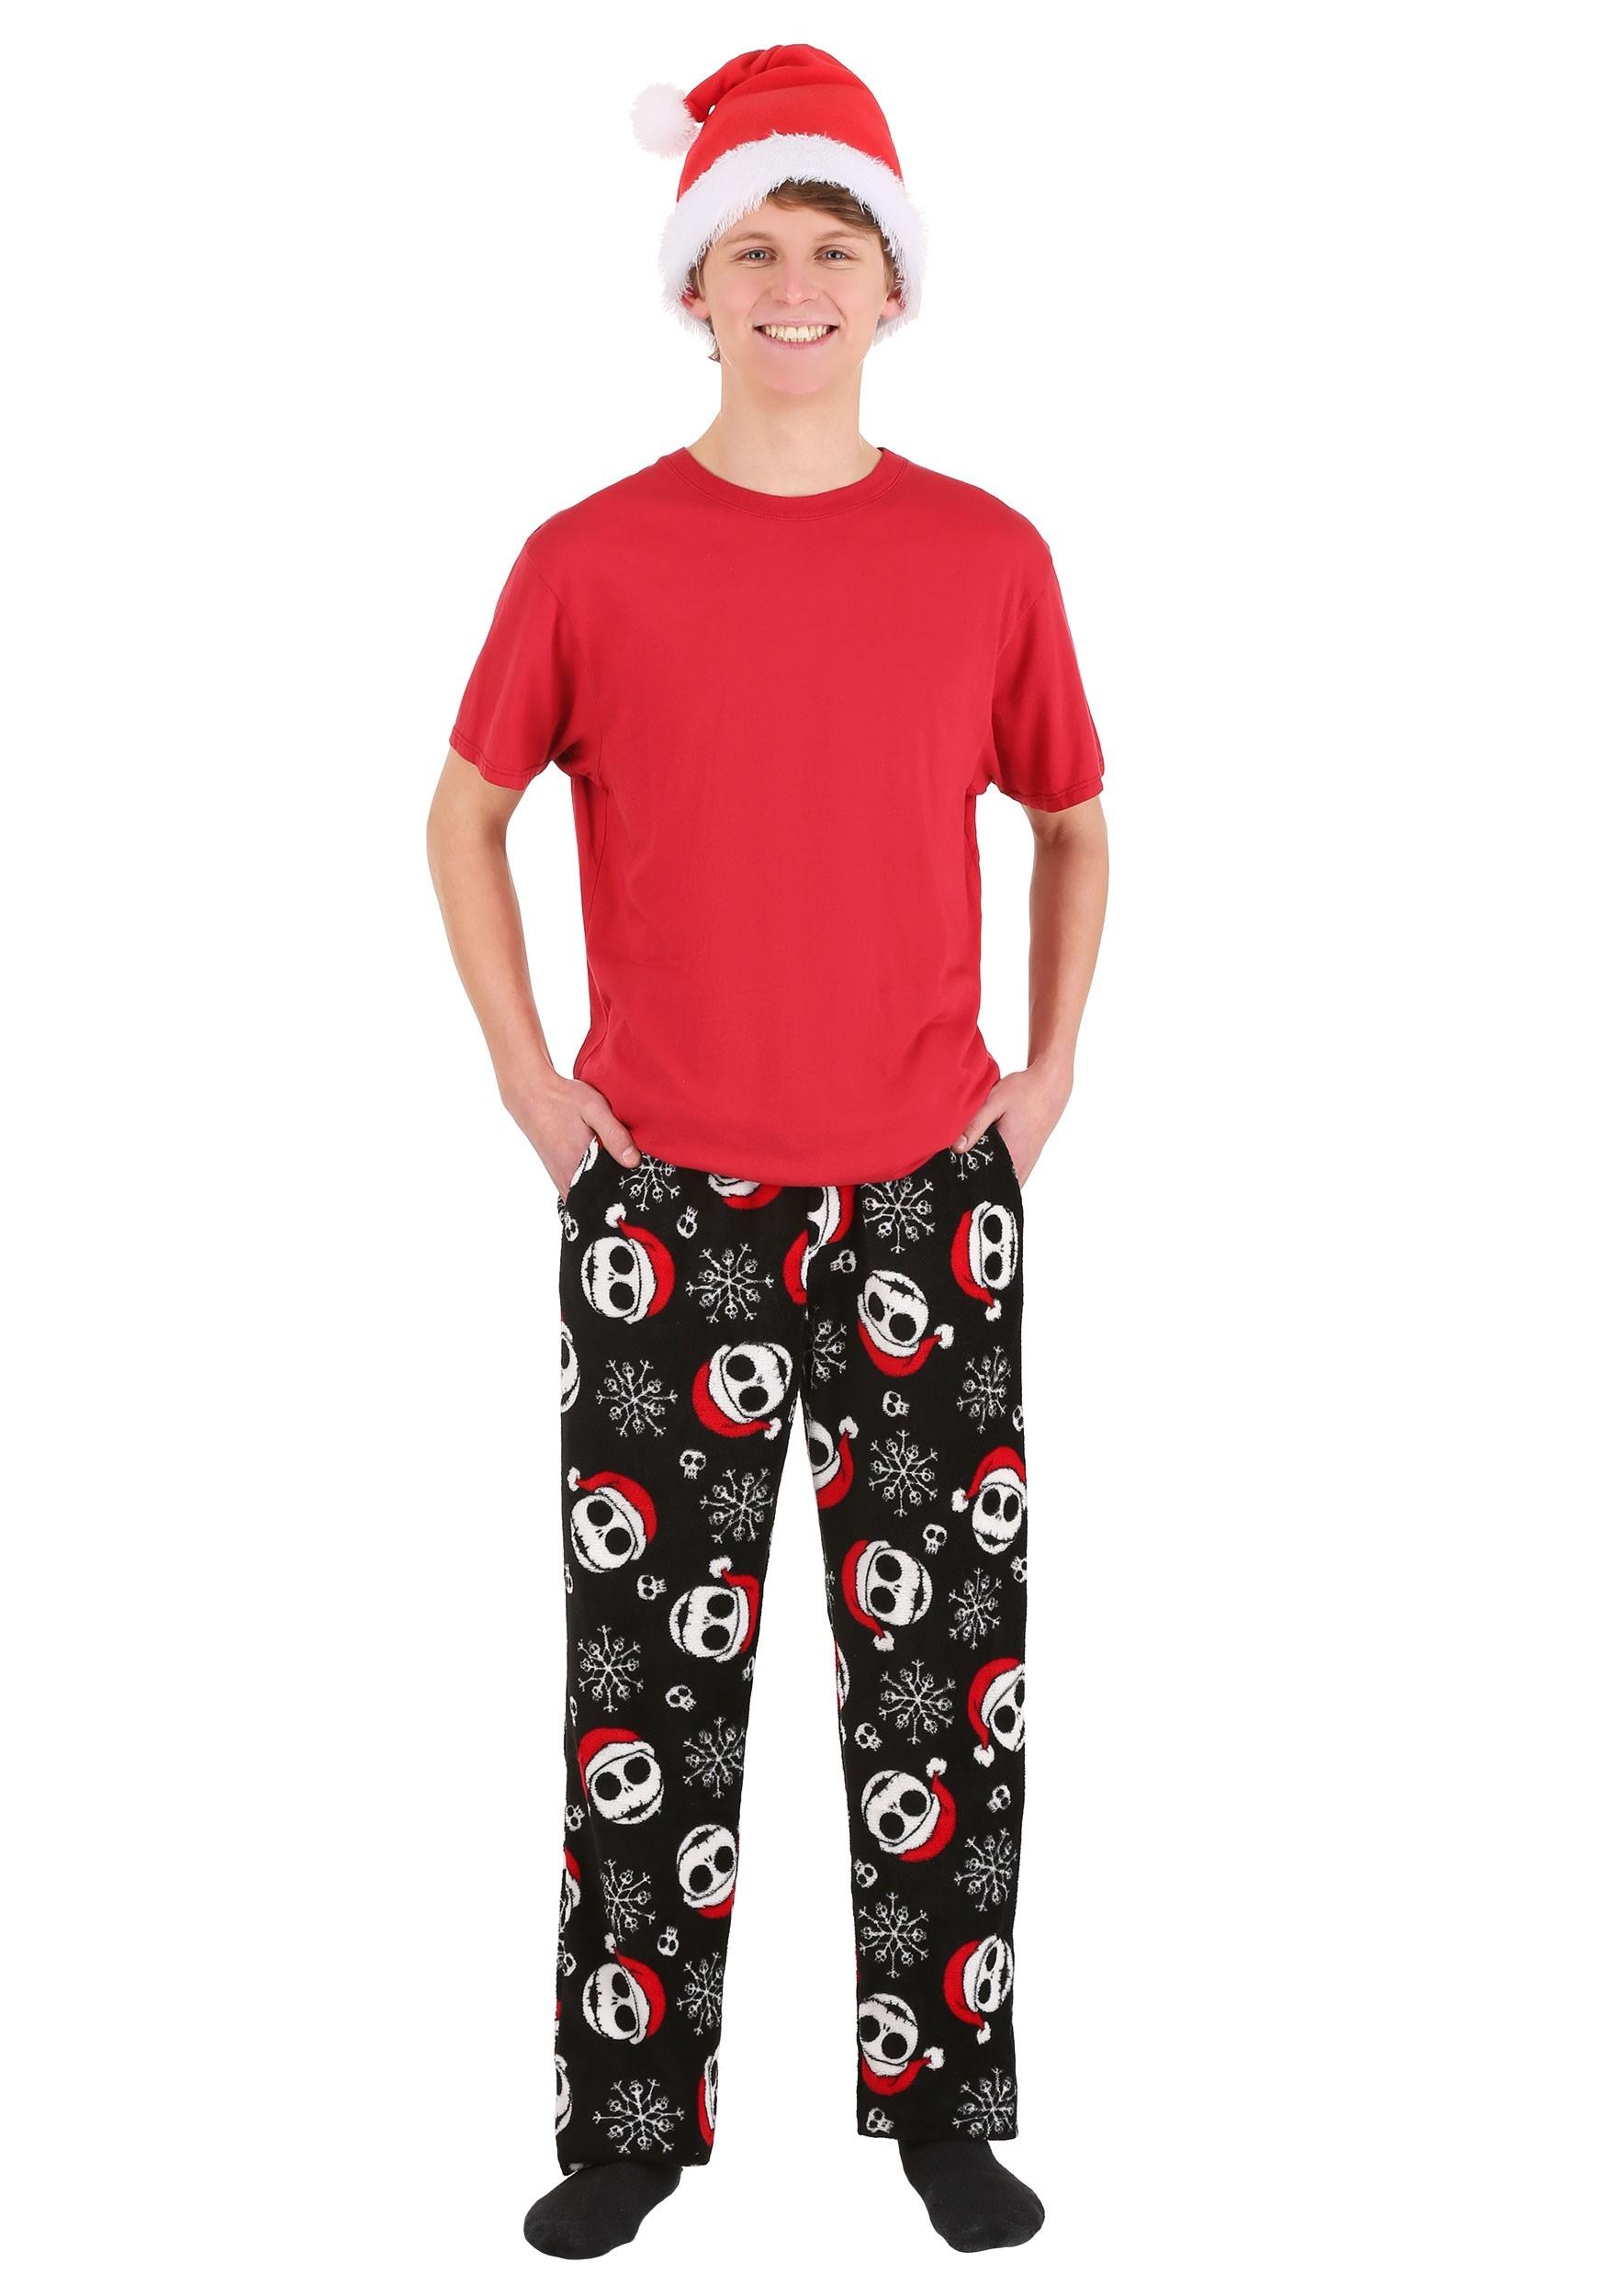 Jack Skellington Soft Lounge Pants